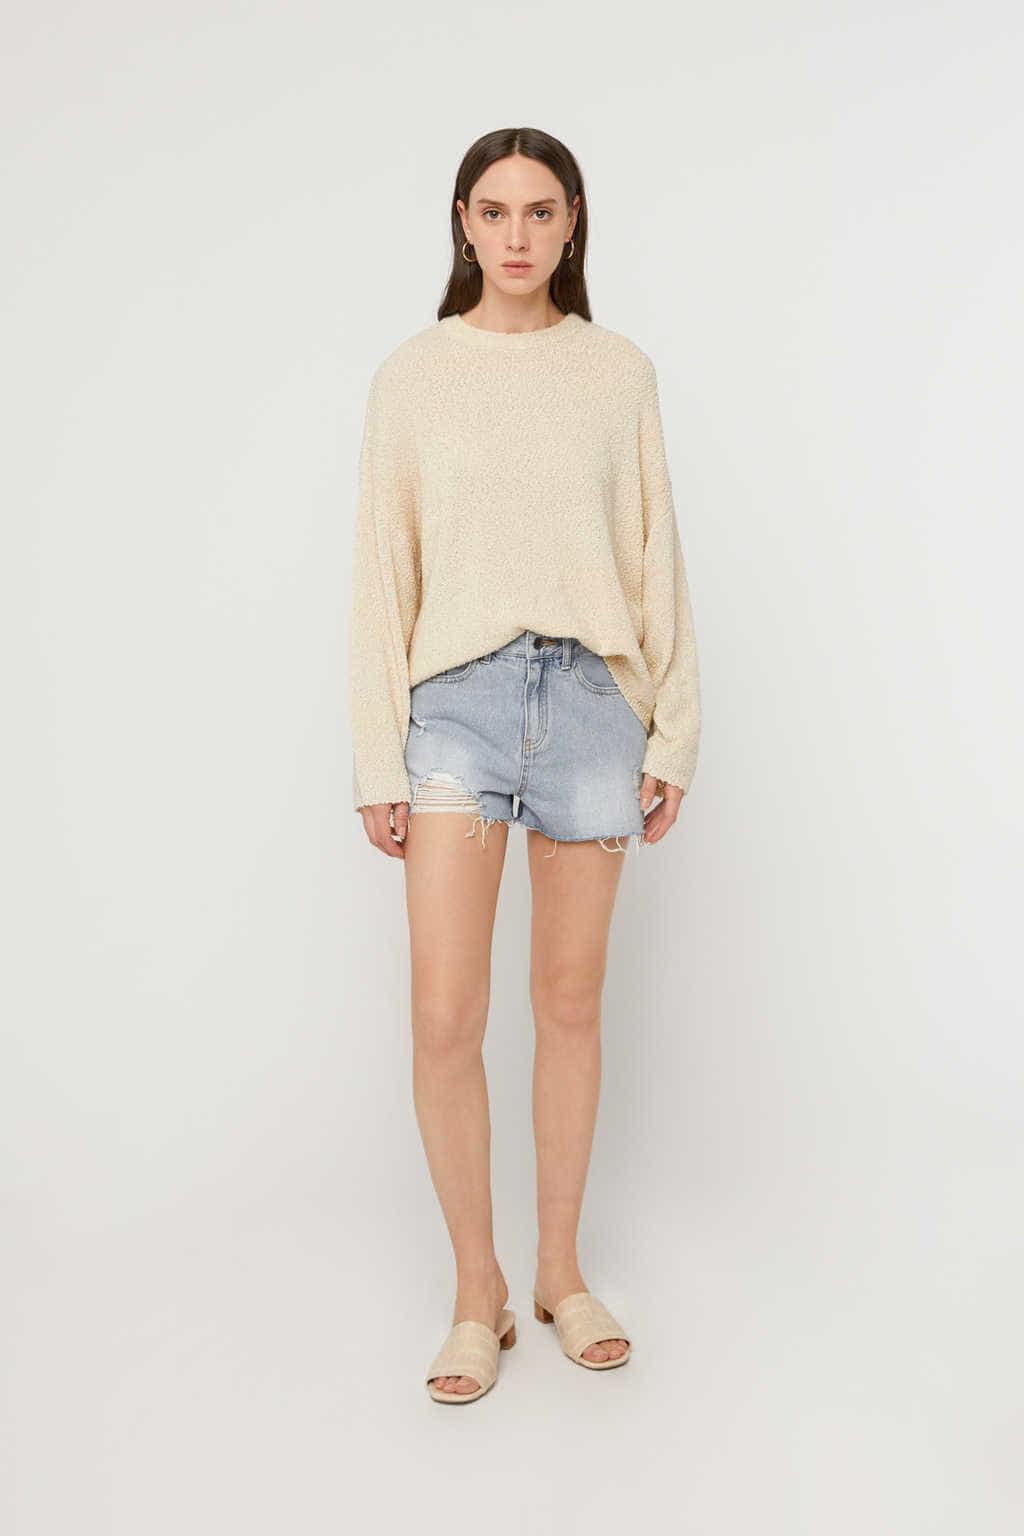 Sweater 3212 Cream 2